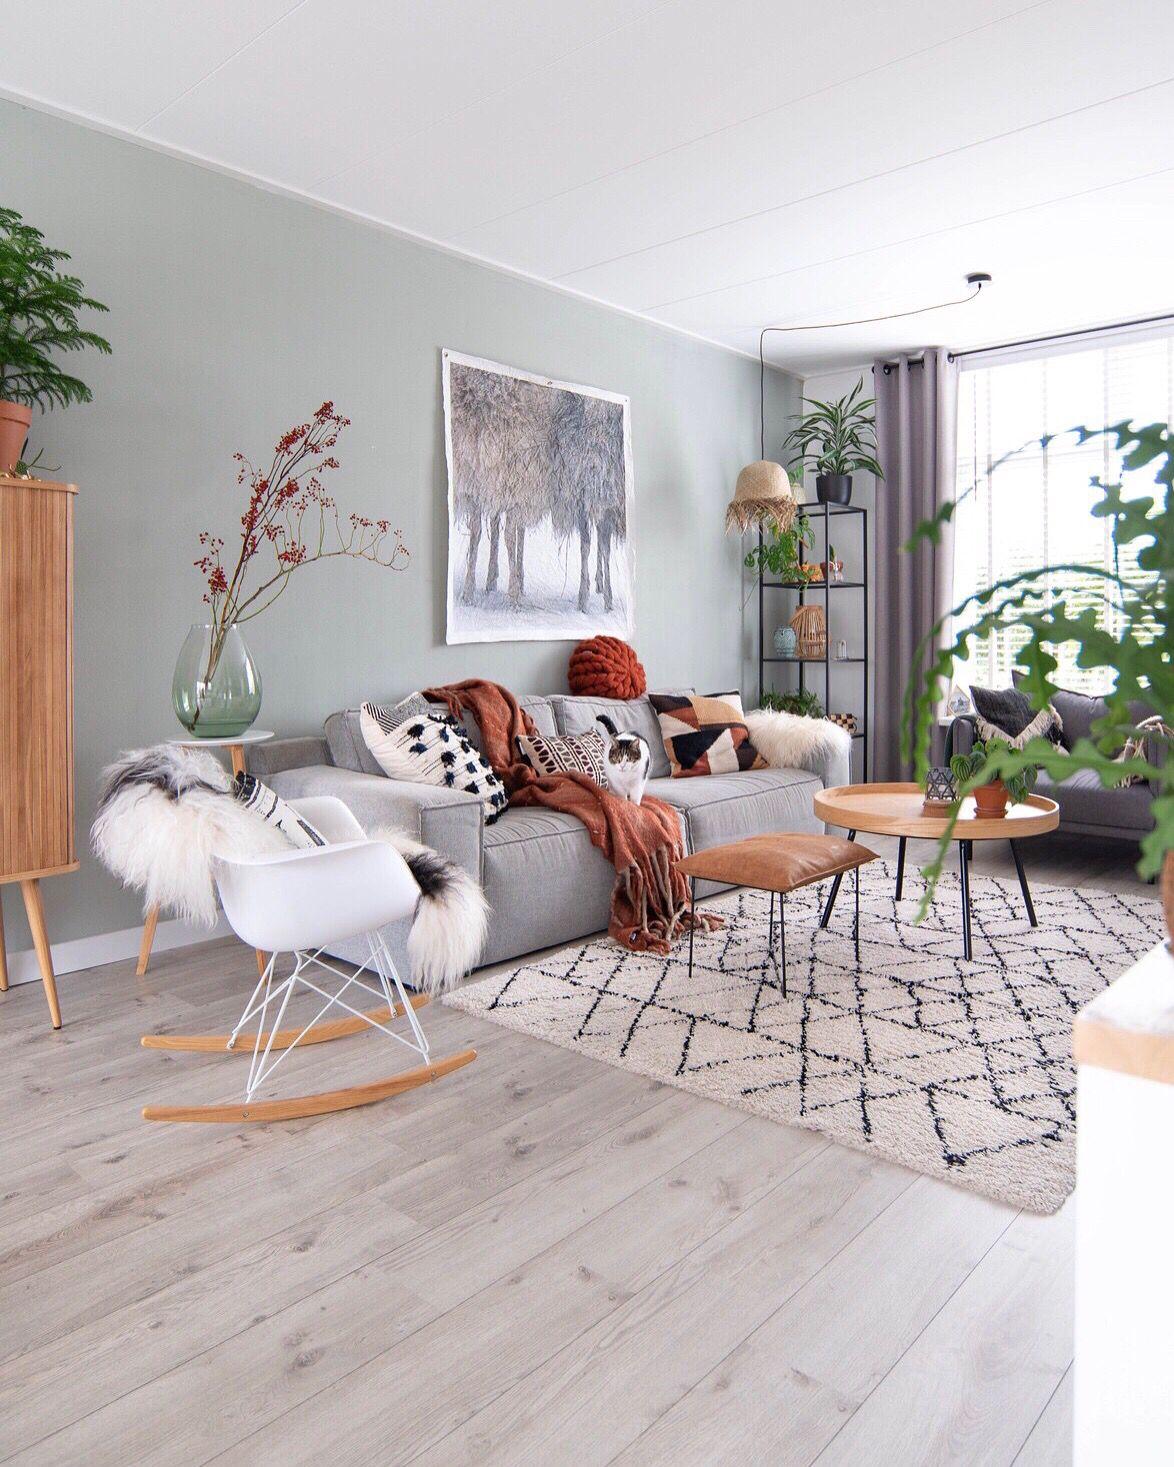 Pale Jade Green by Keeelly91 | Interieur woonkamer, Grijze